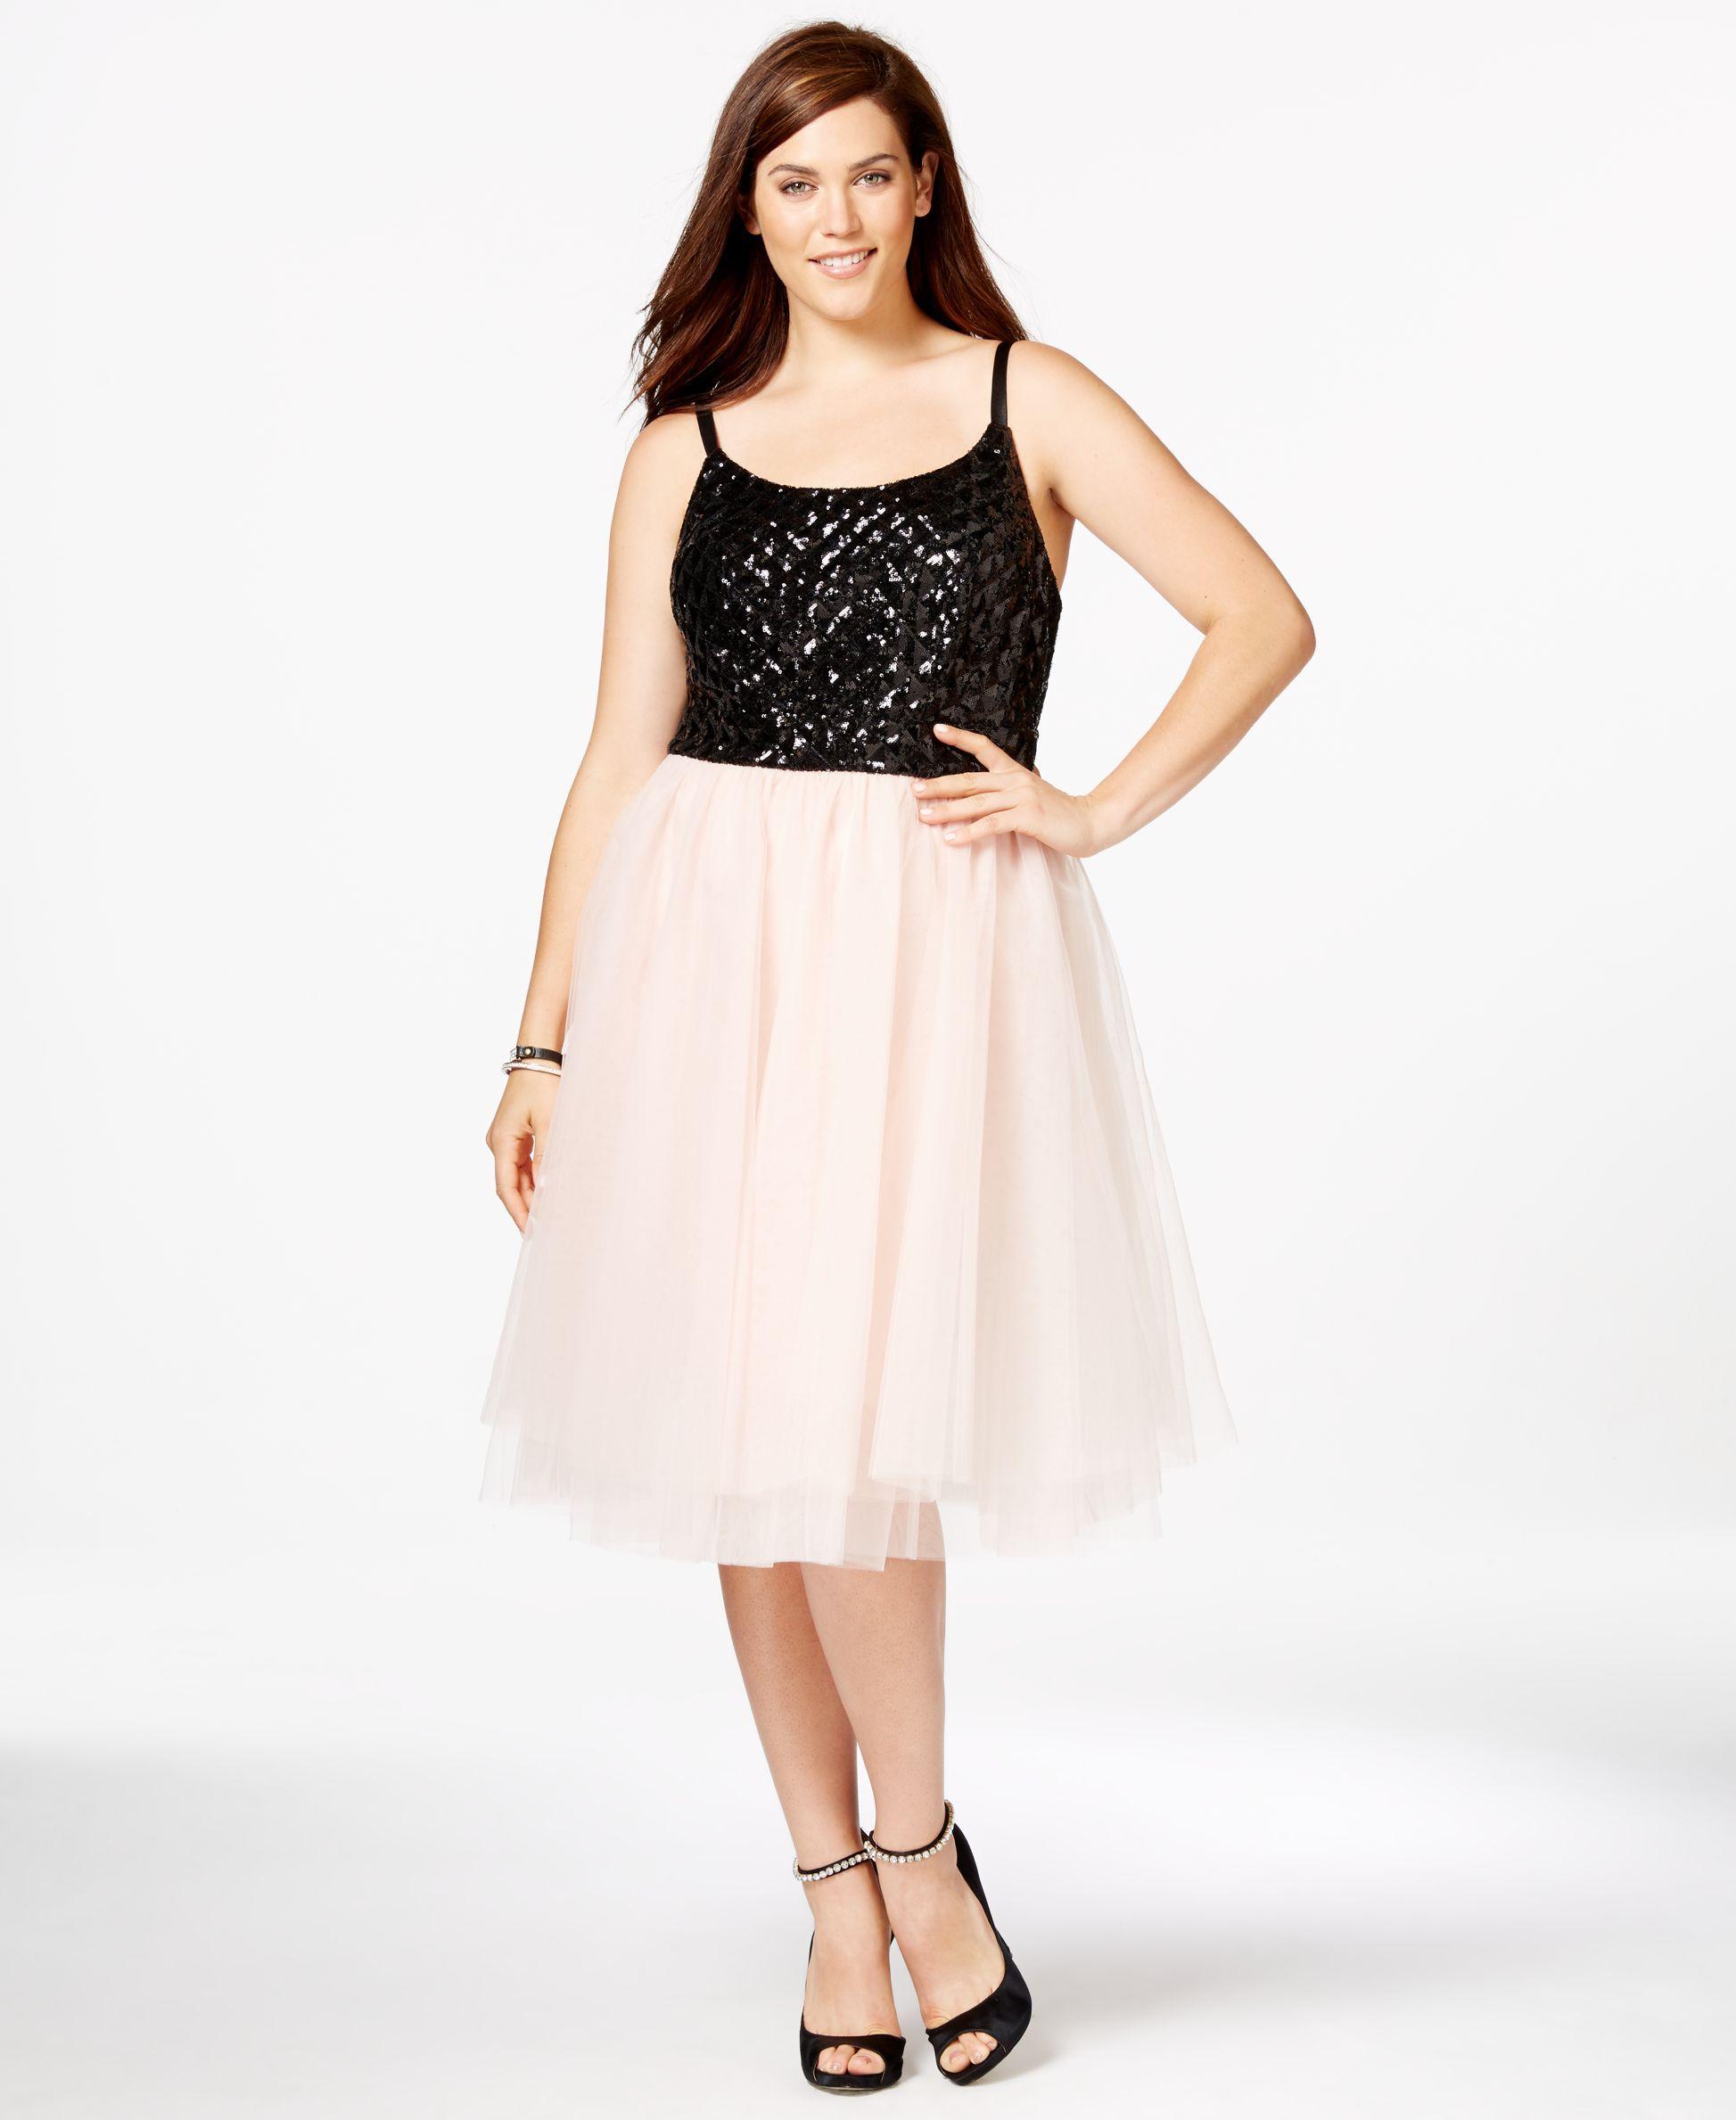 dcb7b6a879d Trixxi Plus Size Sequined Tulle-Skirt Party Dress - Trendy Plus Sizes -  Plus Sizes - Macy s